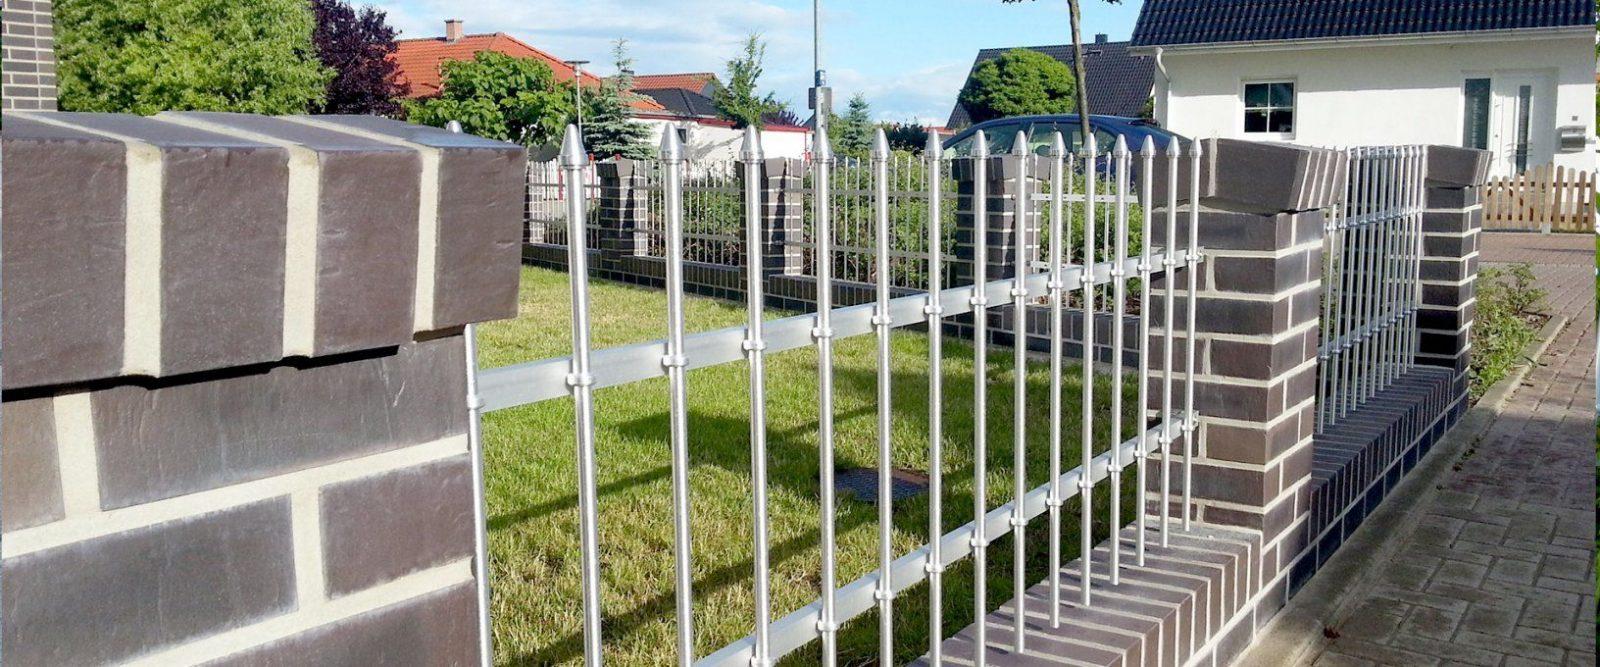 Selbstbauzäune  Zaun Selber Bauen  Seiler Zaun Design von Gartenzaun Selber Bauen Metall Photo